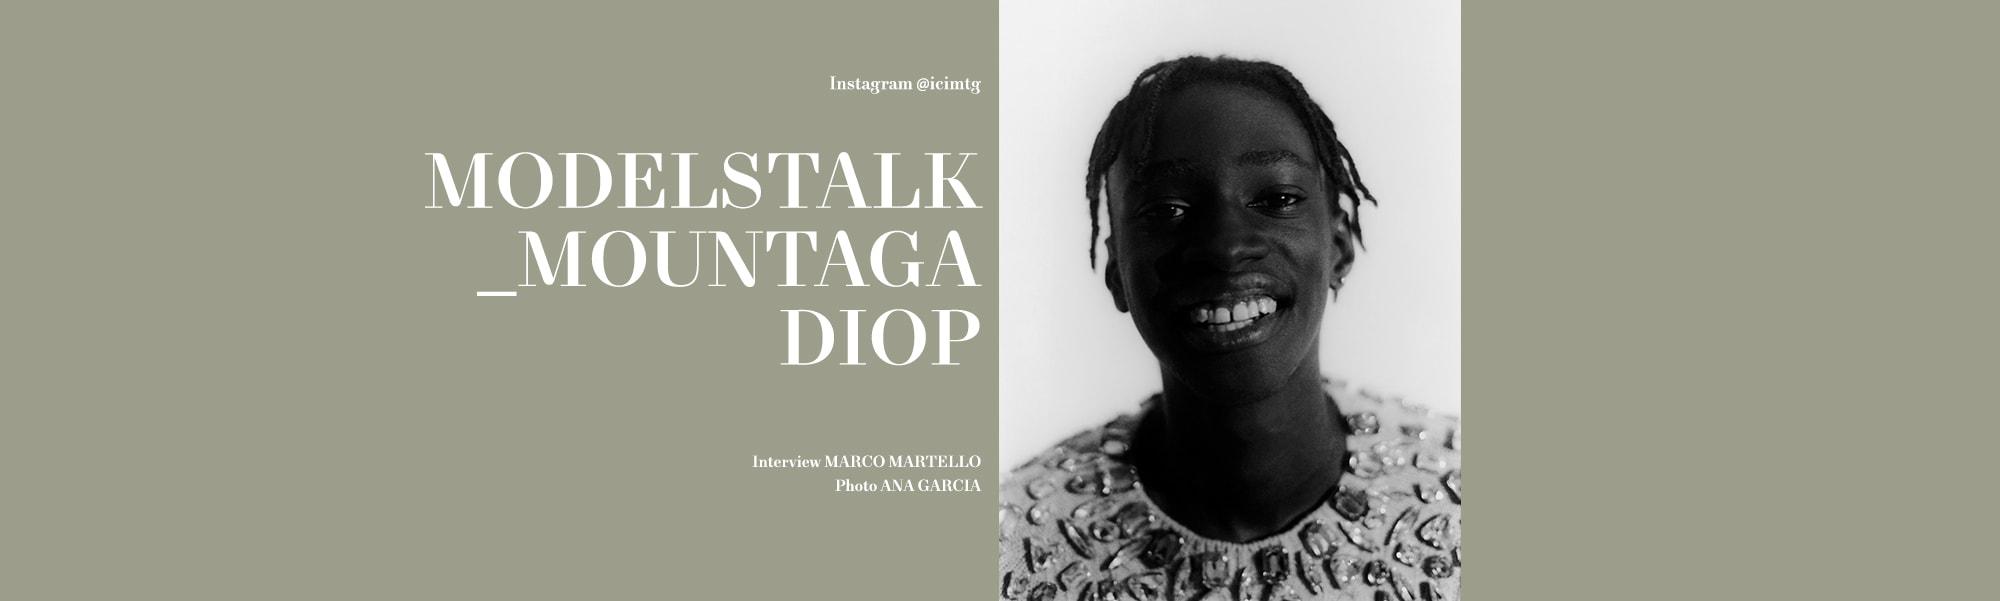 TheGreatestMagazine_TalkingHeads_Mountaga_banner